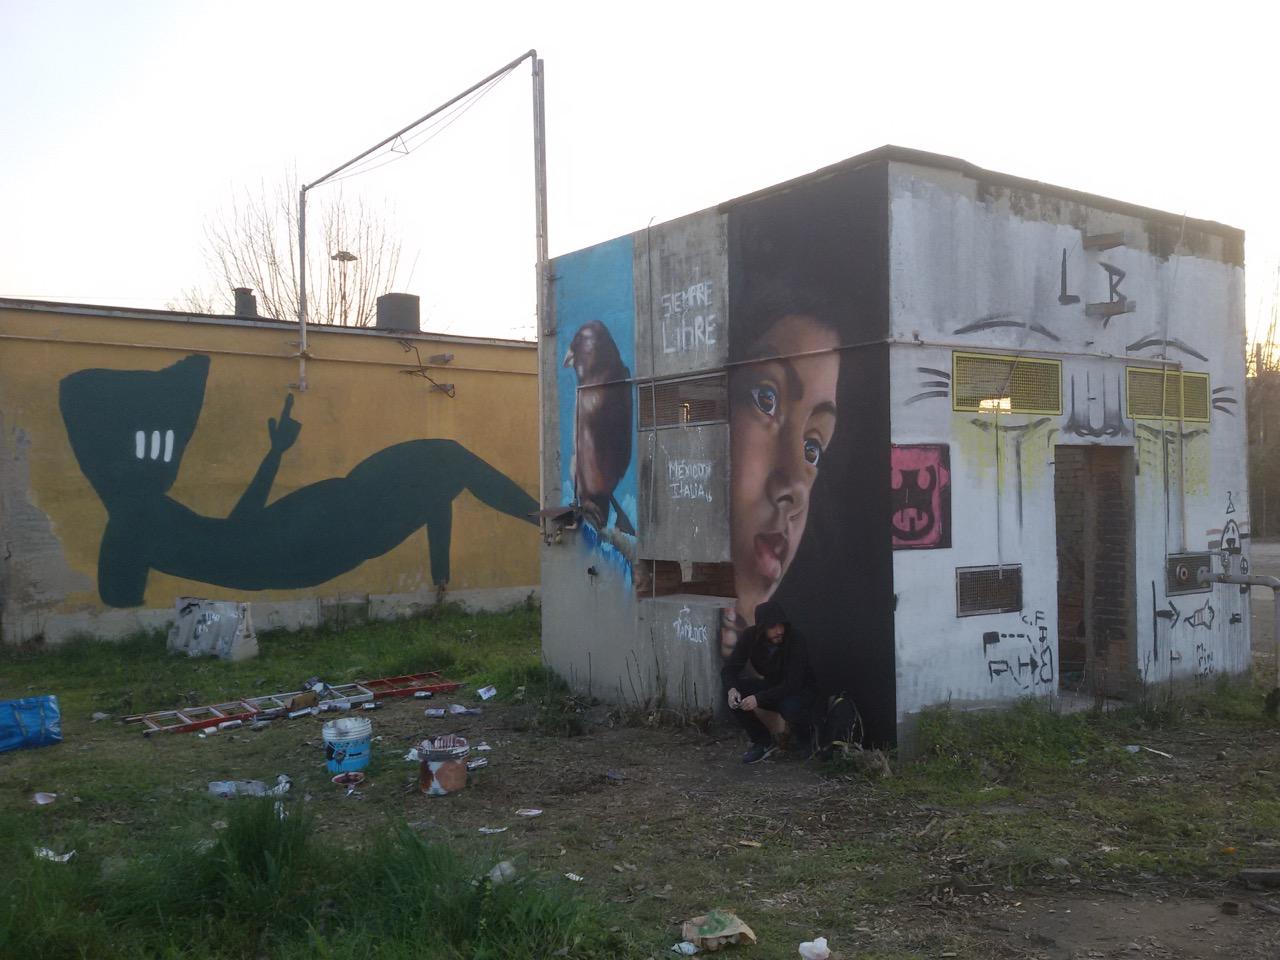 SinPasarte-StreetArt-RUSCO-Bolonia-019